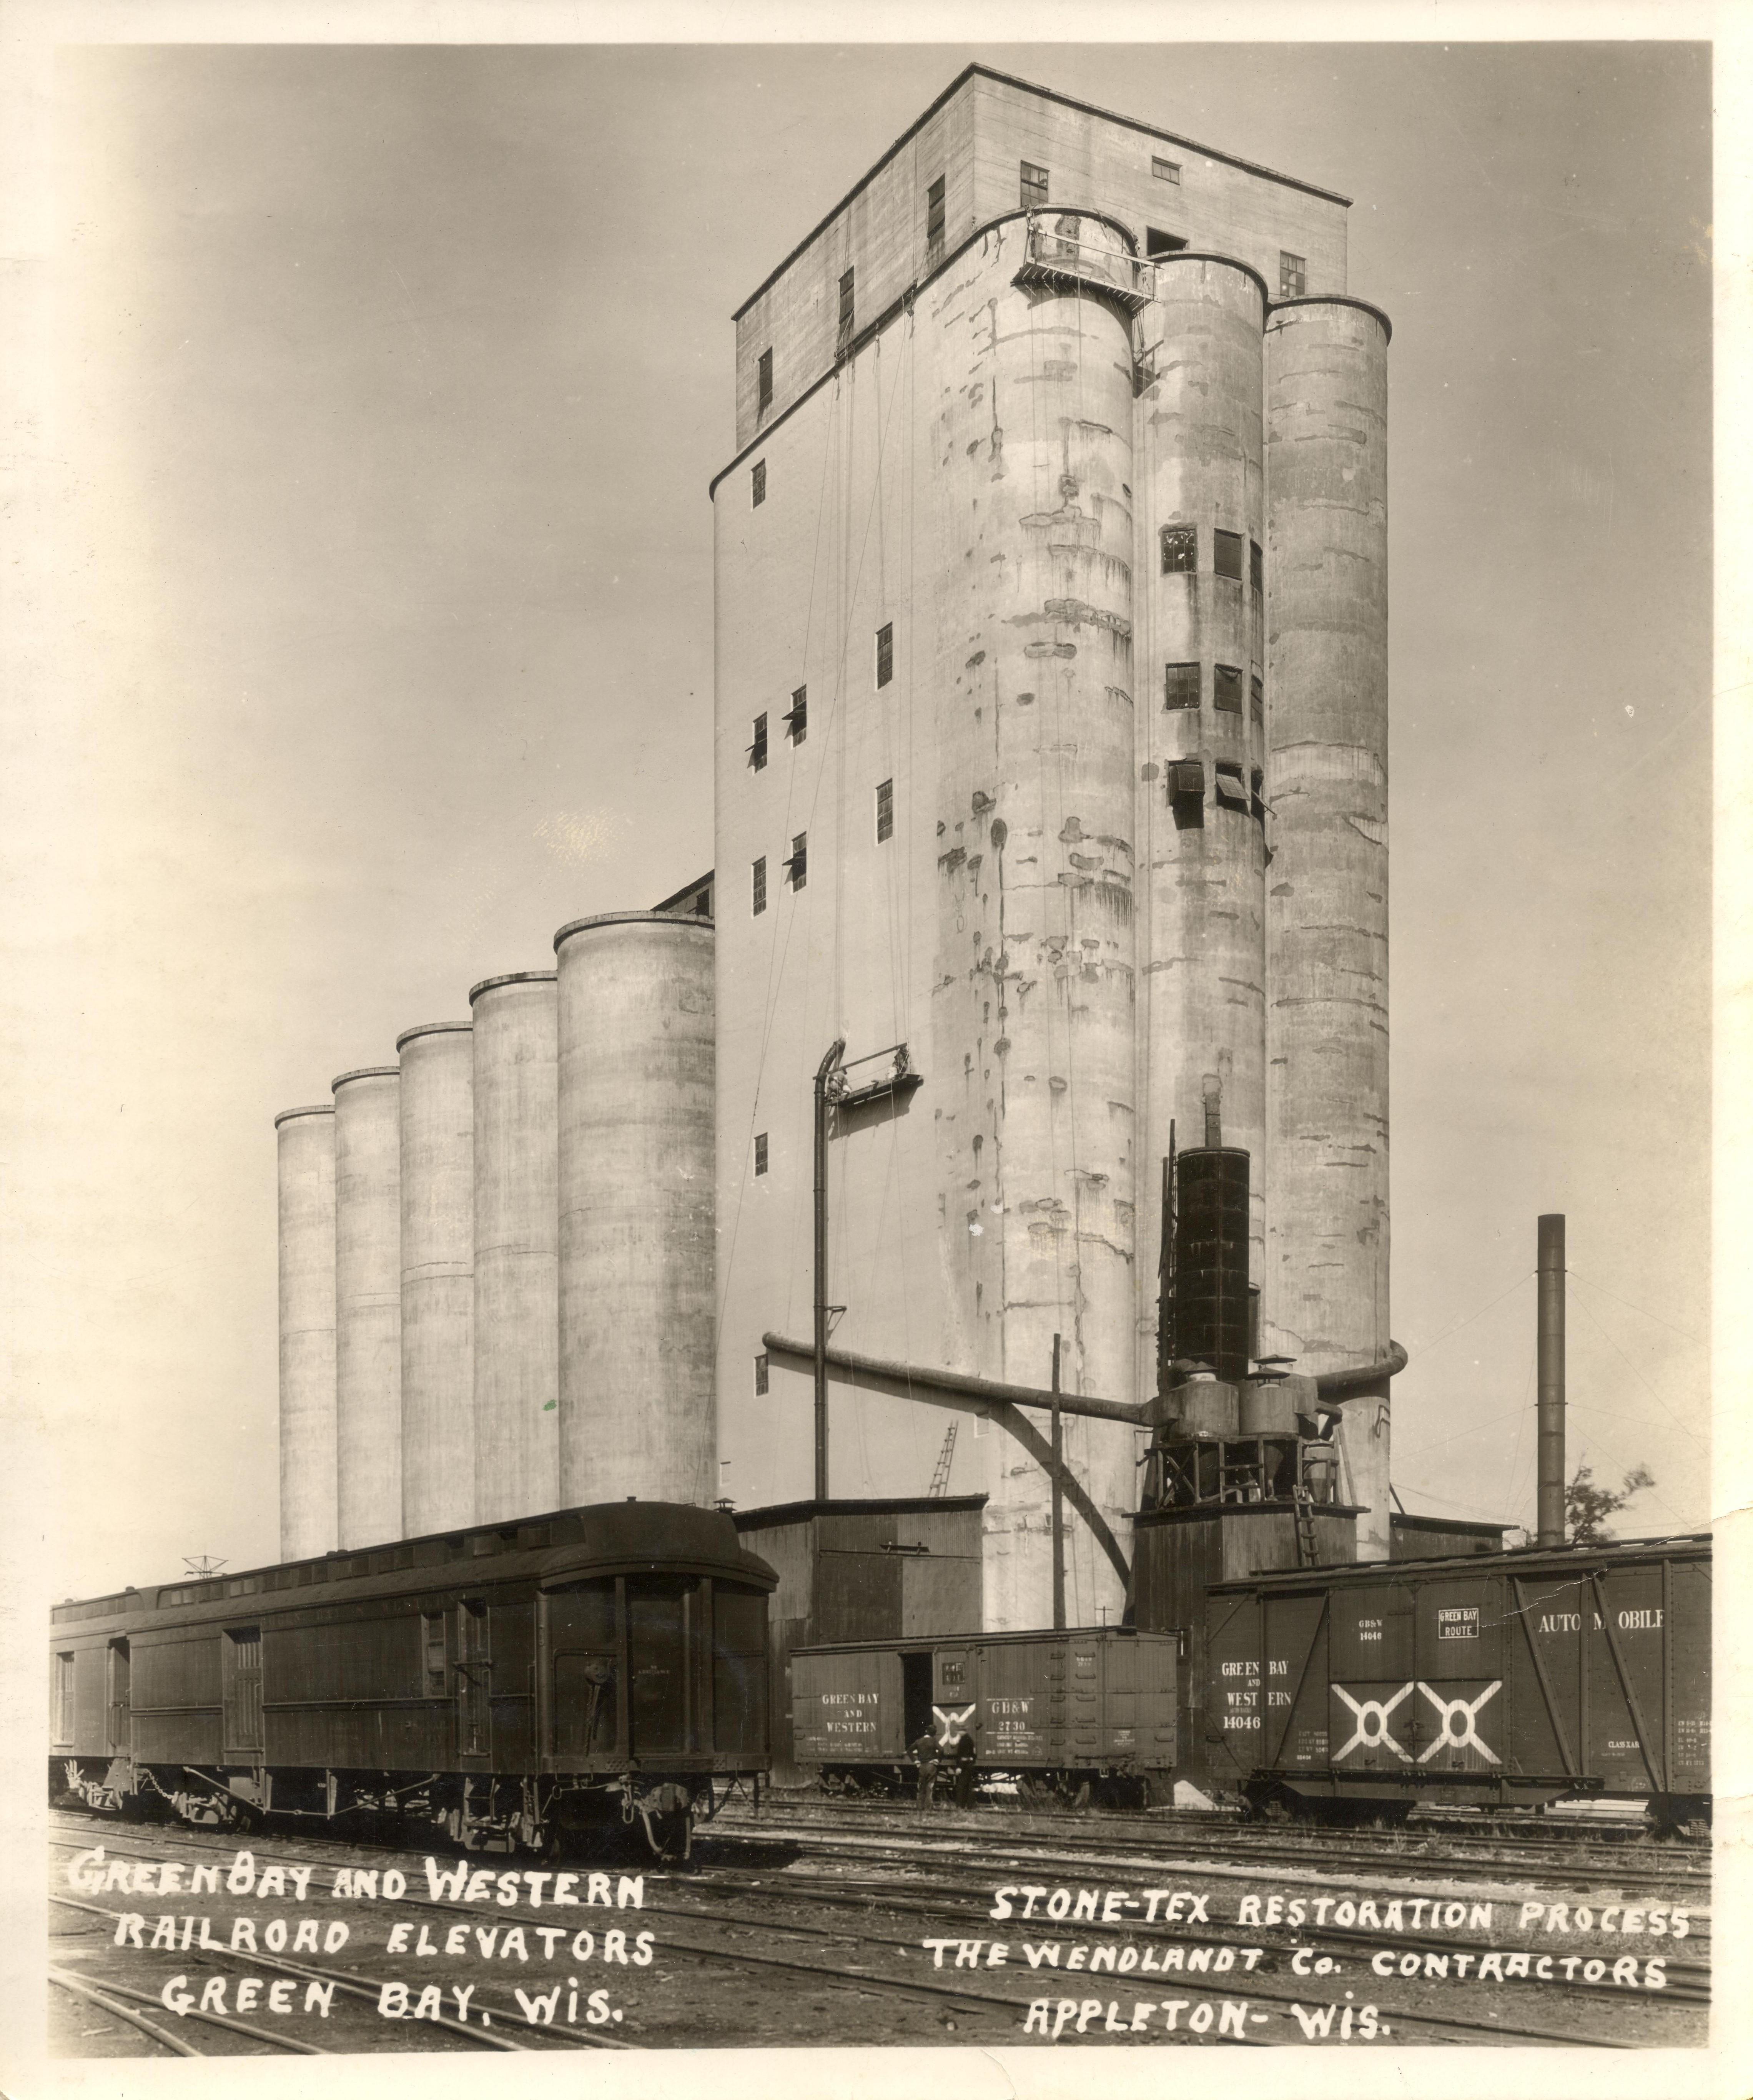 railelevators